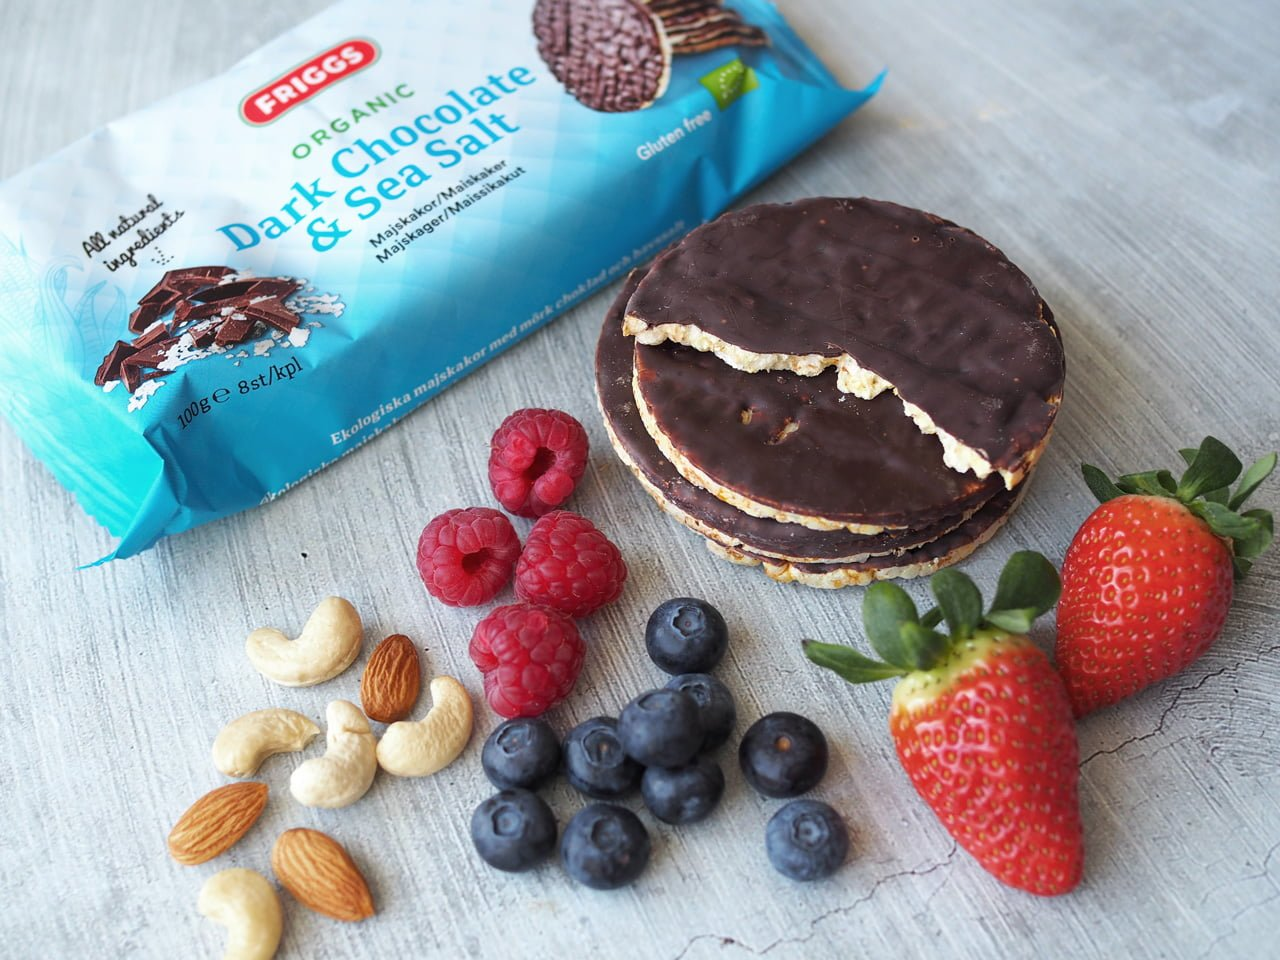 friggs ekologiska majskakor choklad